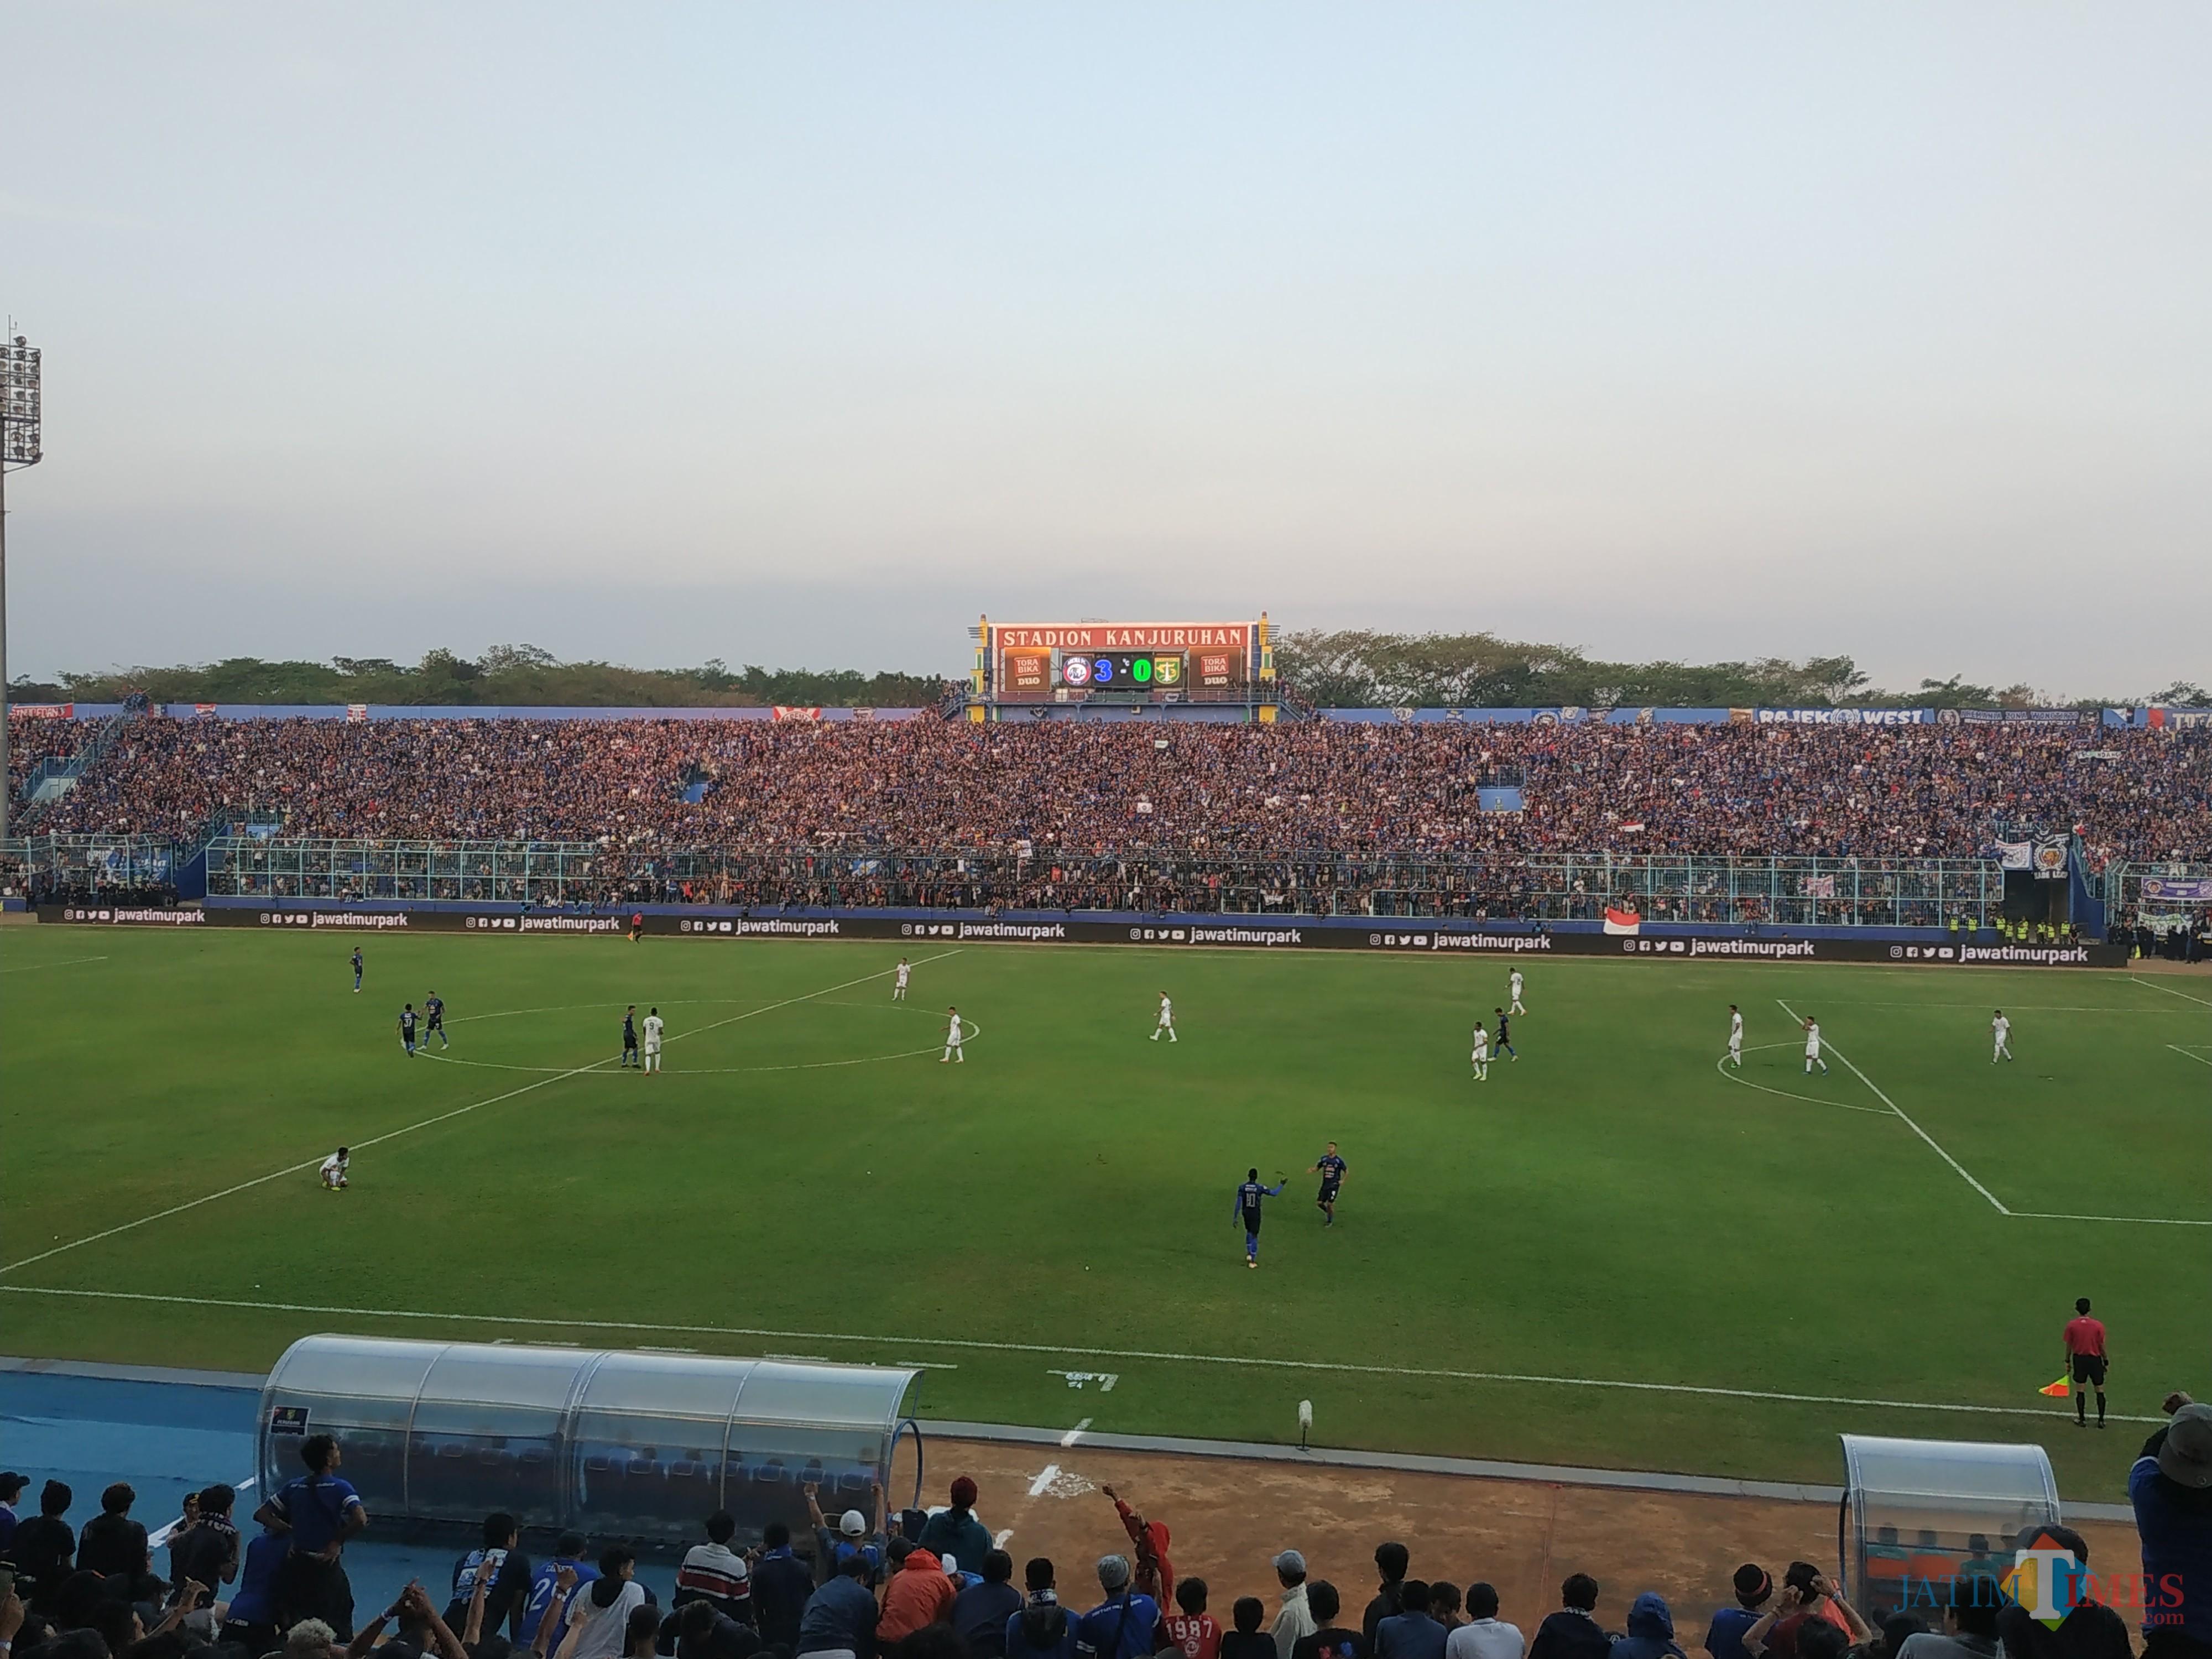 Aremania ketika mendukung Arema FC berlaga. (Hendra Saputra)